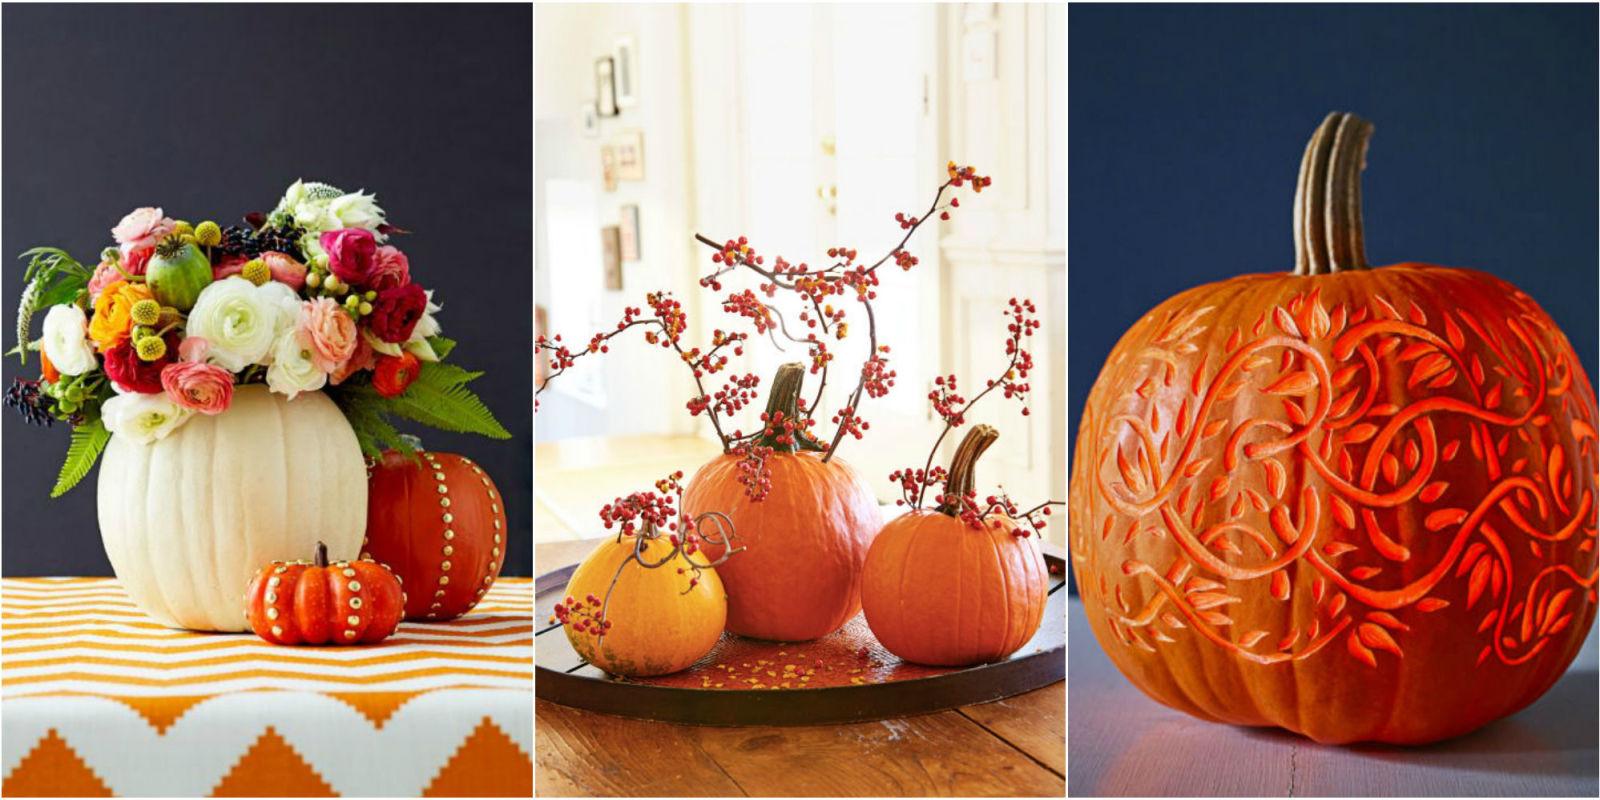 Pumpkin designs we love for decorating ideas